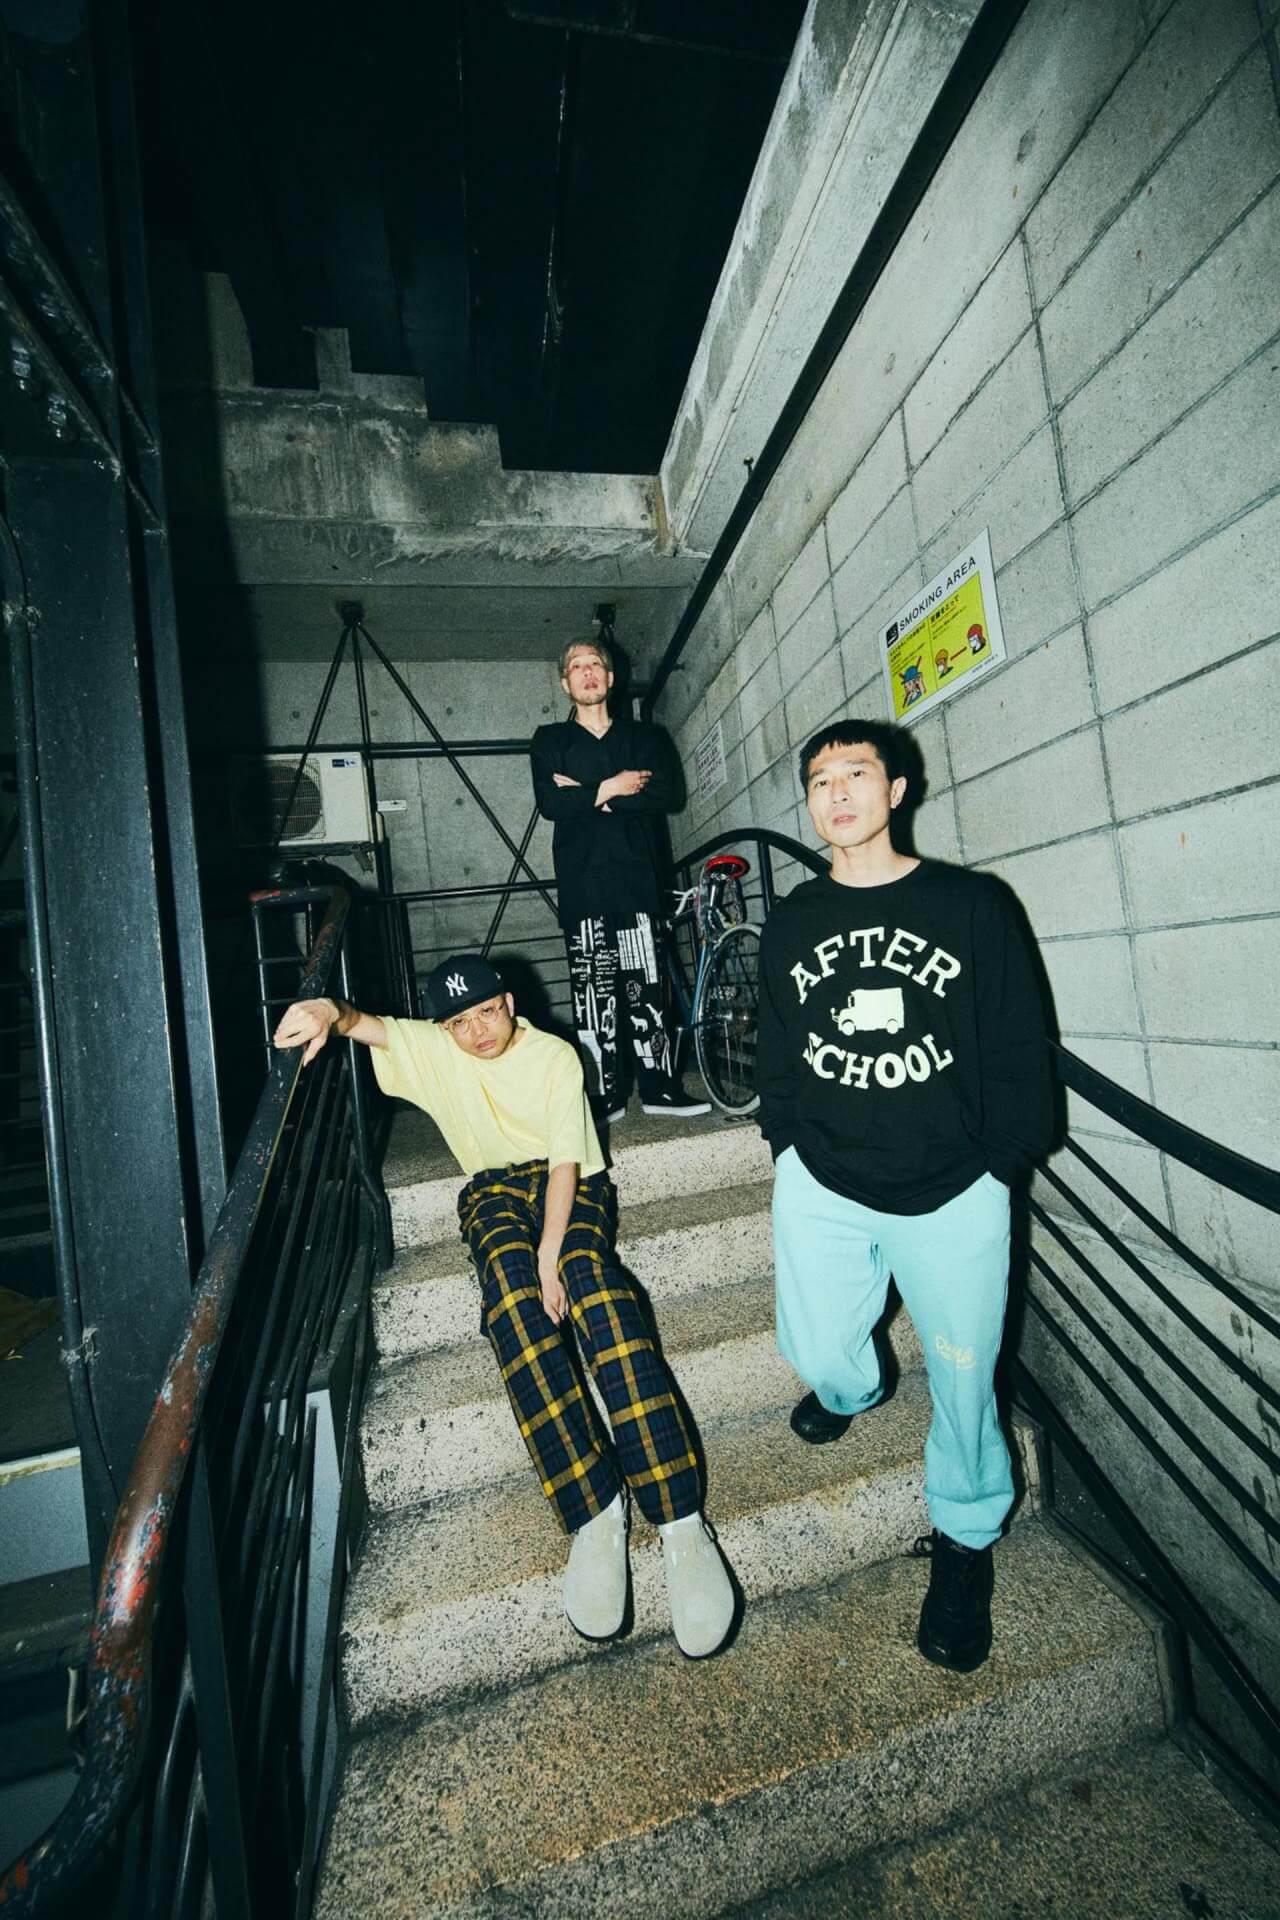 『Music Is Love』をリリースしたKONCOSのポップアップショップが新代田POOTLEで開催! life210421_koncos_anoraks_2